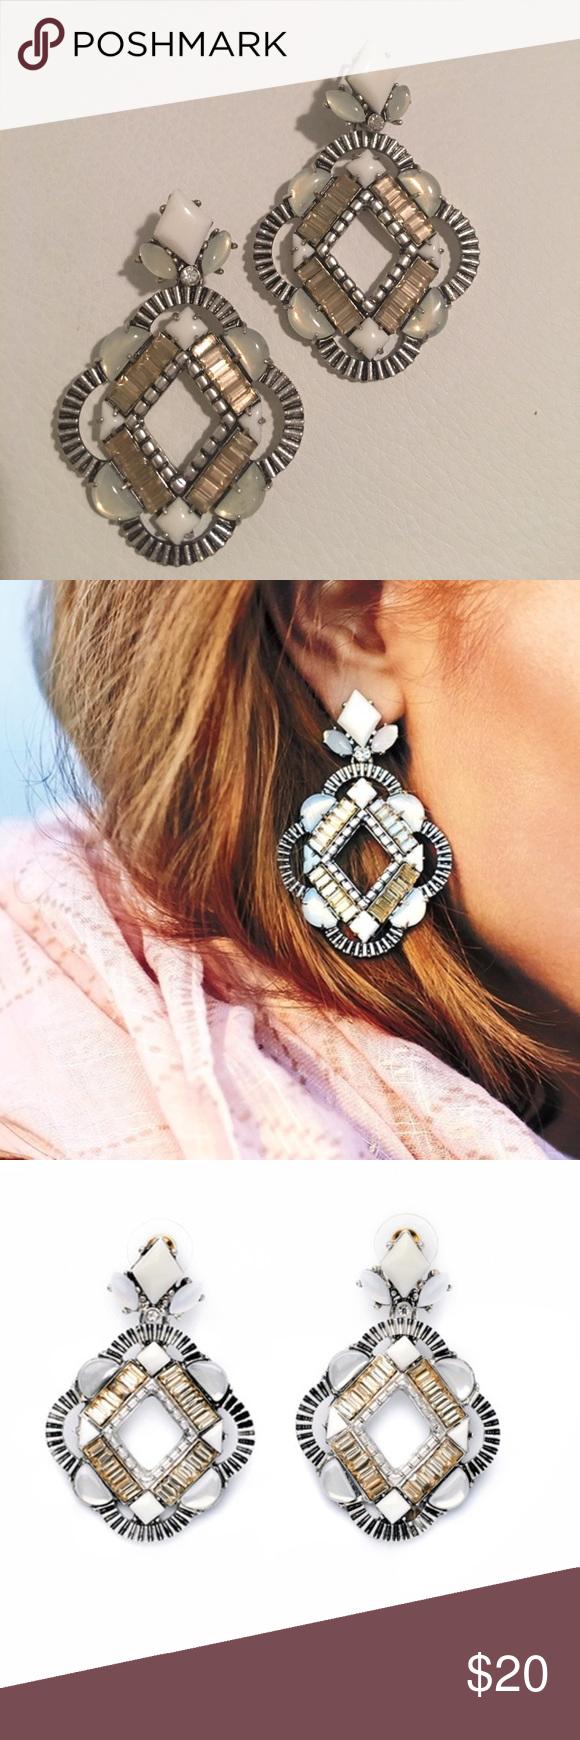 Stella & Dot Kaia Earrings Stella & Dot Kaia Earrings Stella & Dot Jewelry Earrings